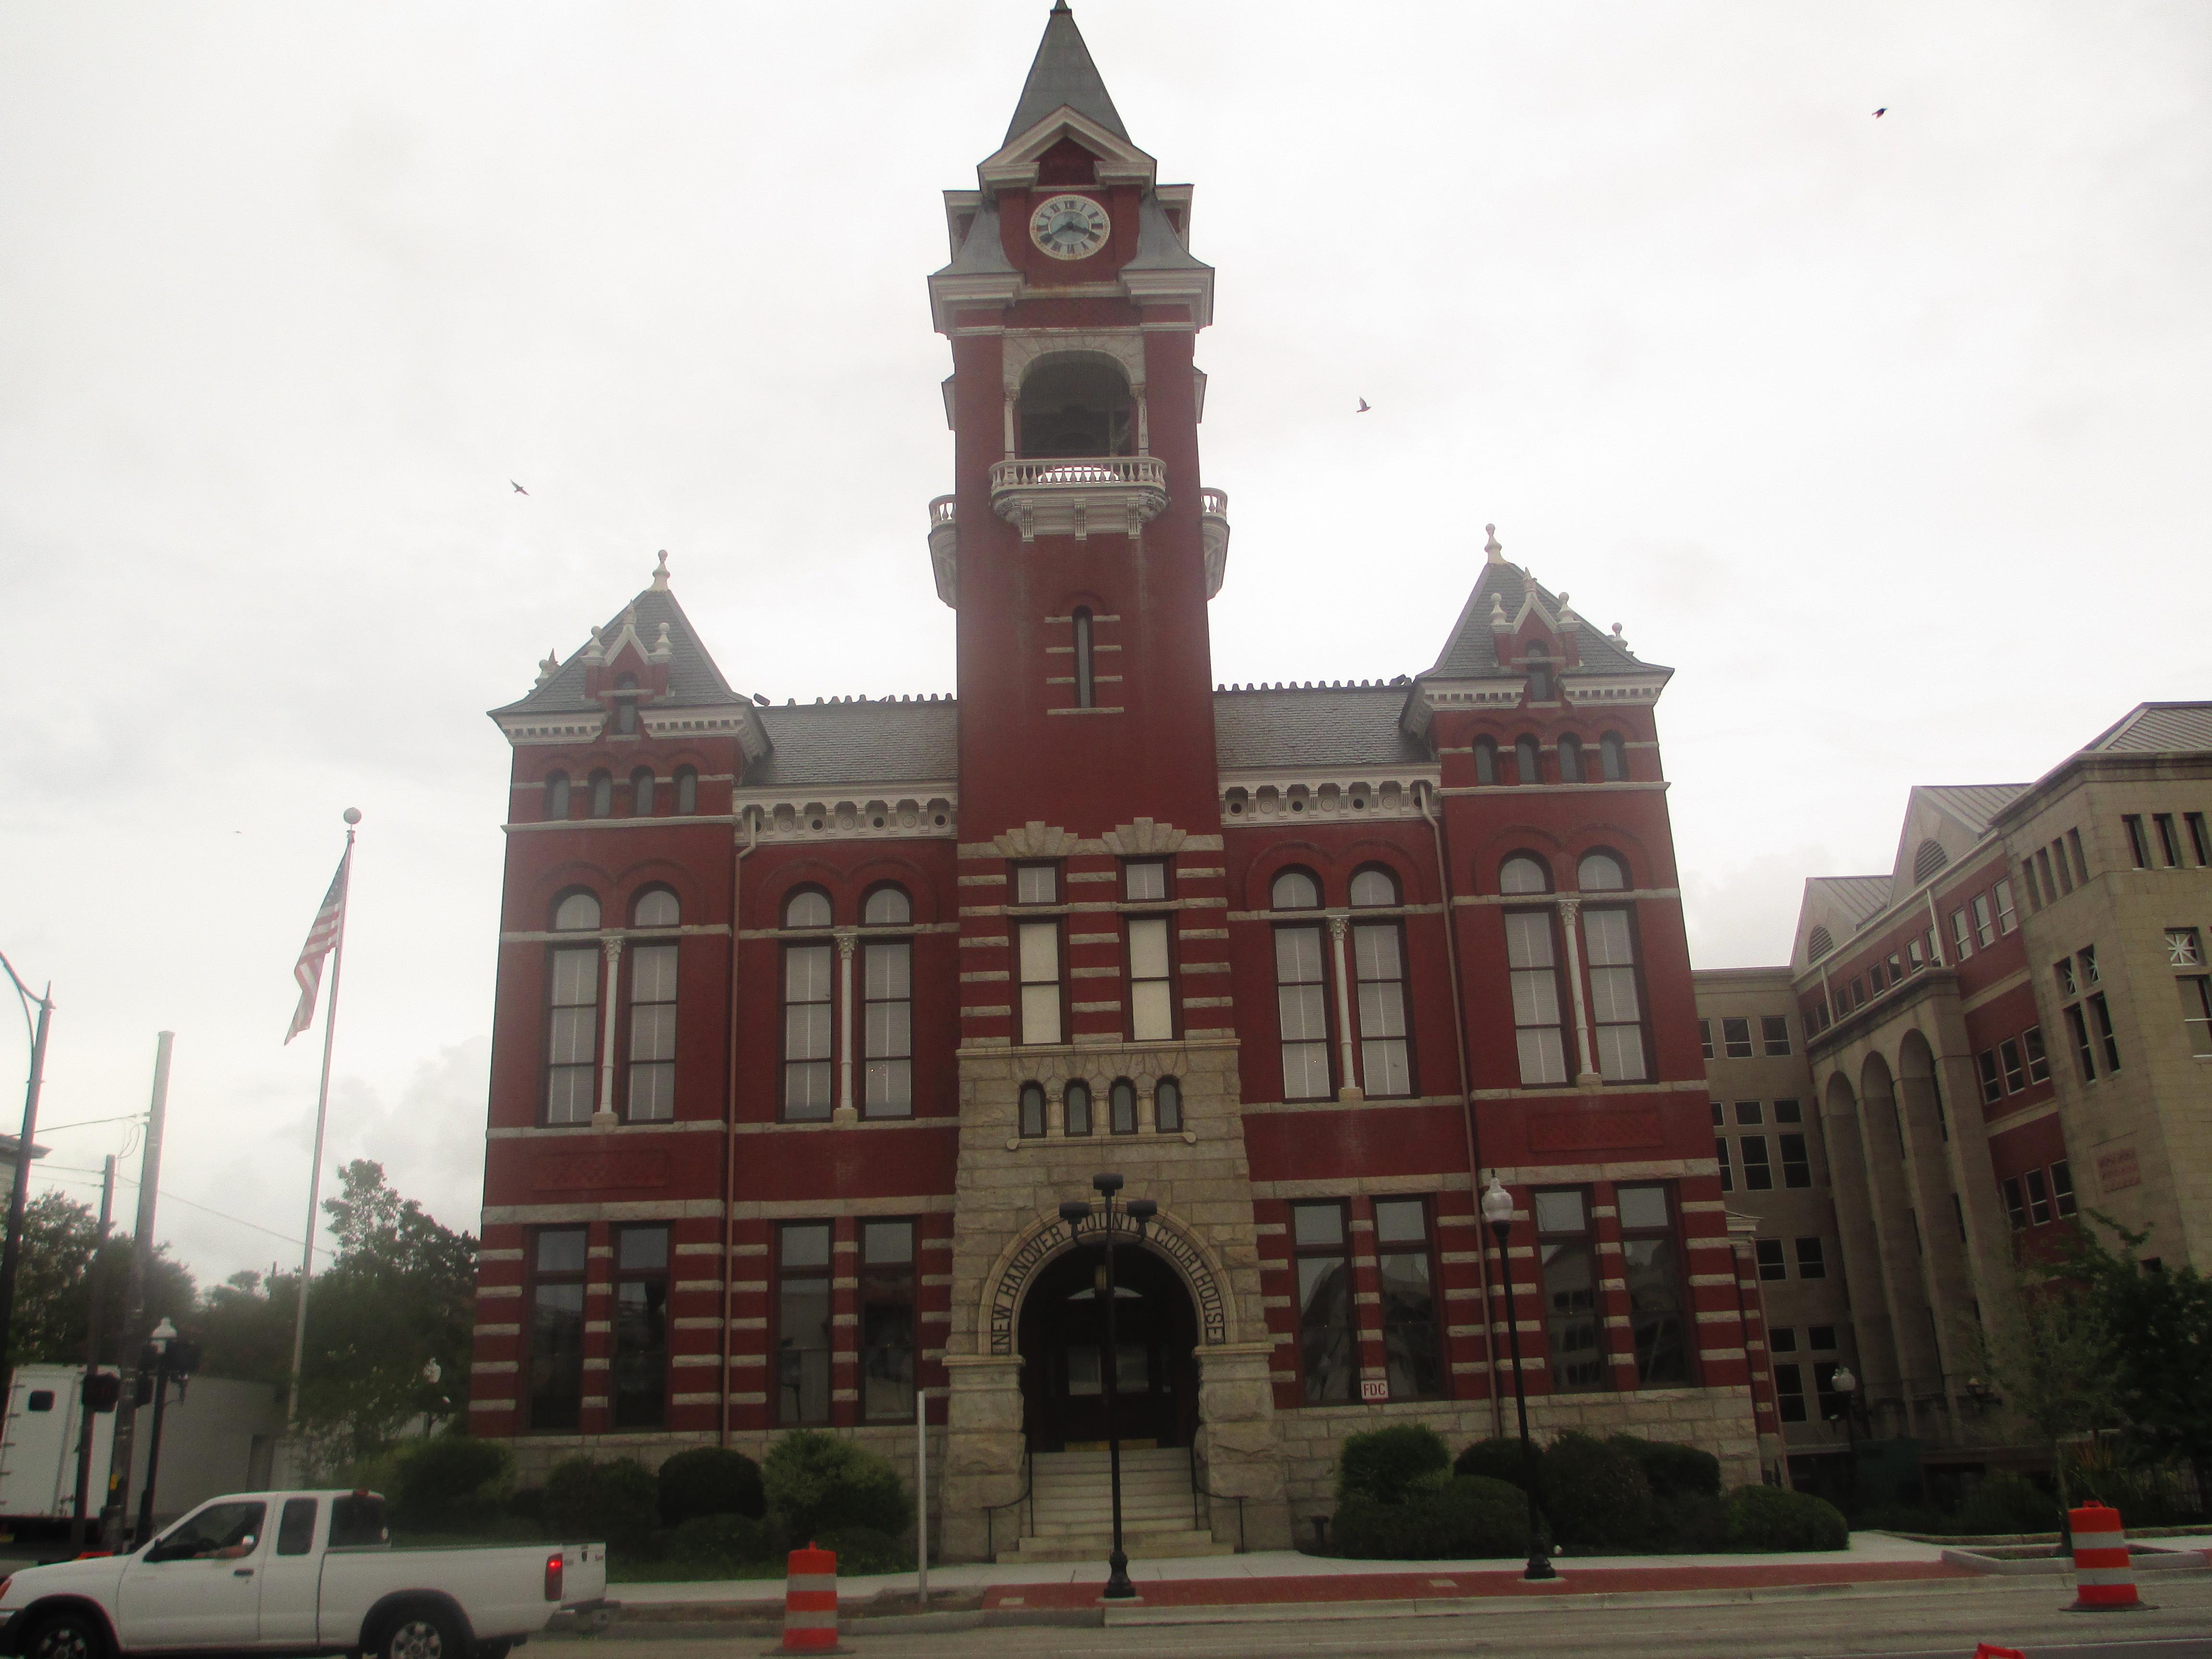 File:New Hanover County, NC, courthouse IMG 4363.JPG - Wikimediabalance of new hanover county